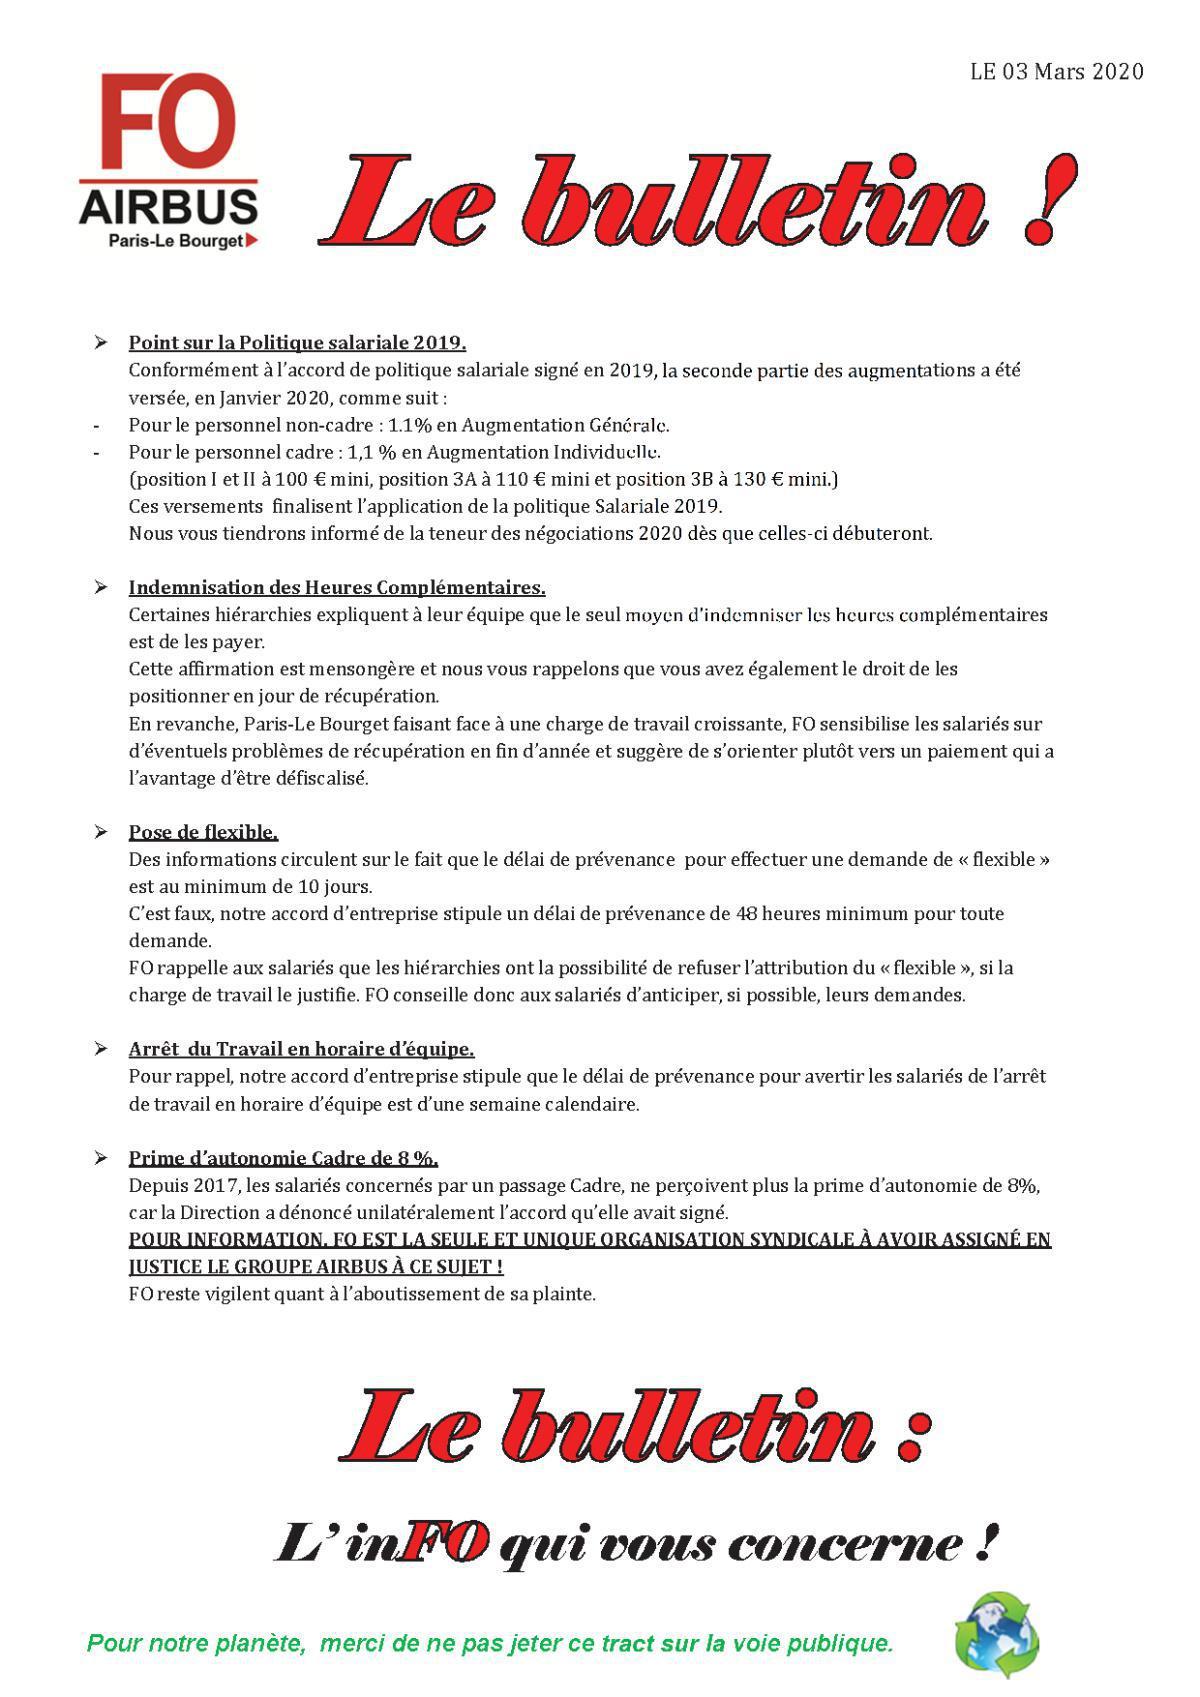 Le Bulletin !